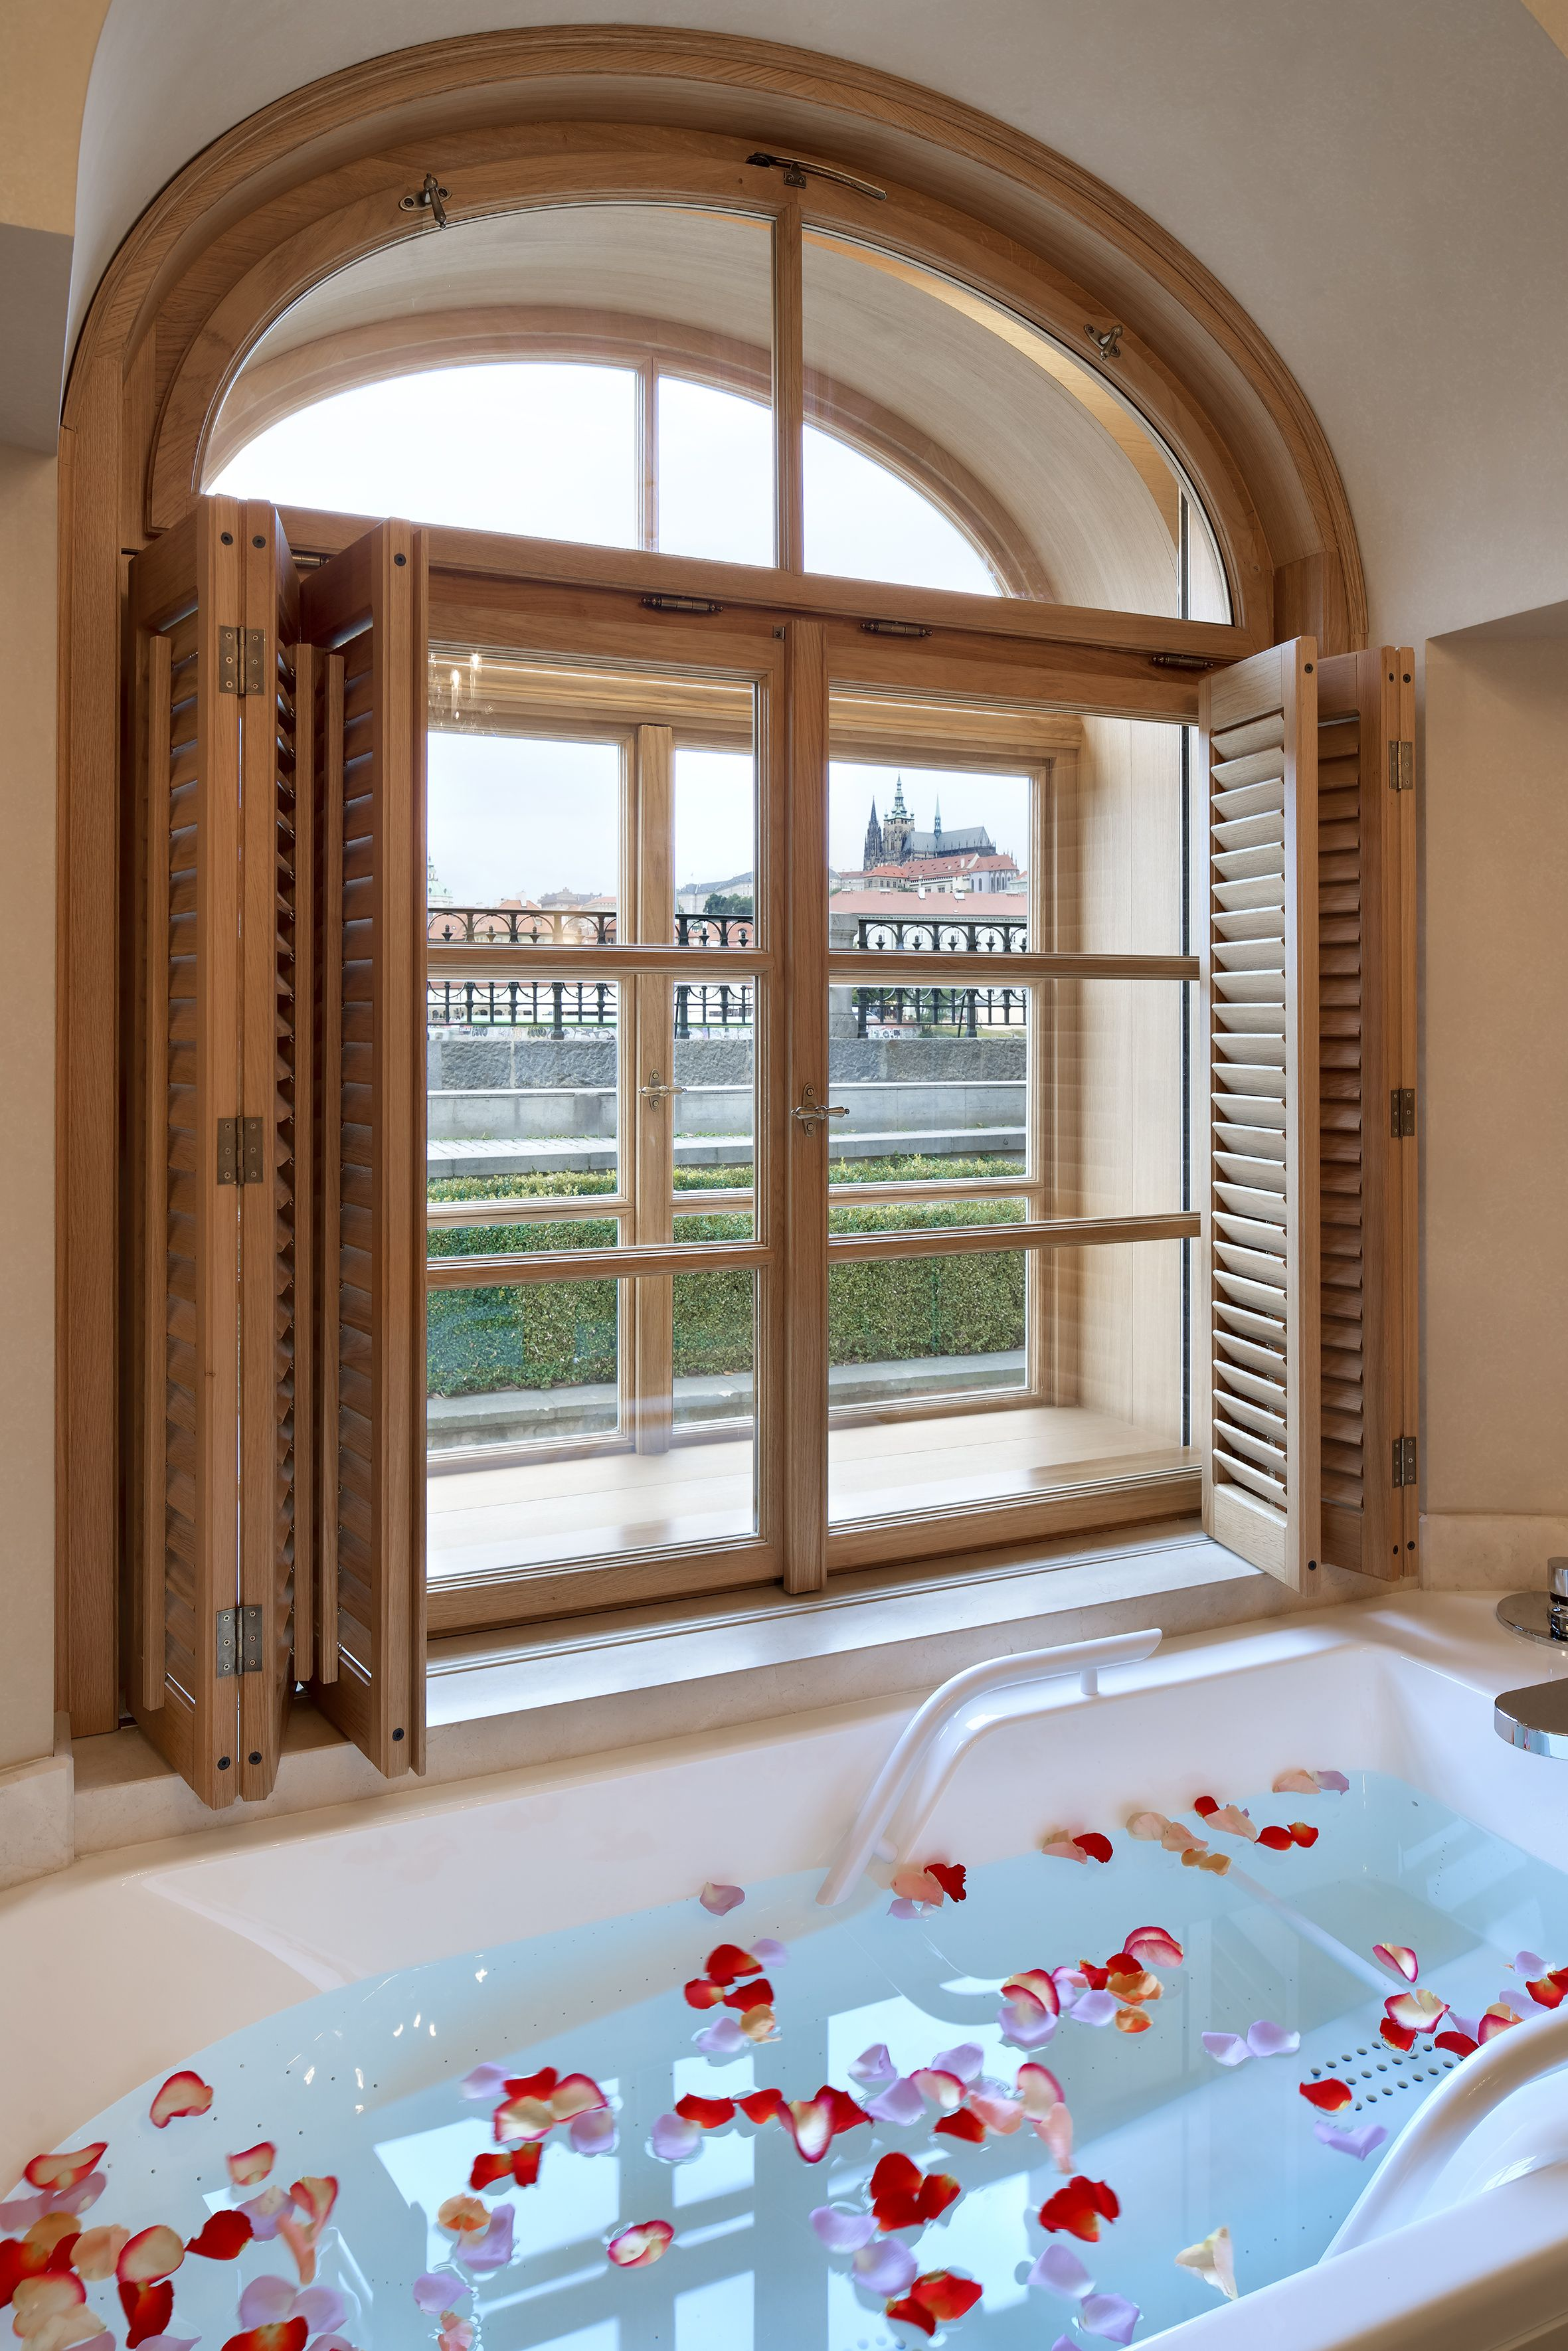 Feminine bathrooms that promise a refreshing dip decor advisor - Ava Spa By Four Seasons Corridor Detail Ava Spa By Four Seasons Pinterest